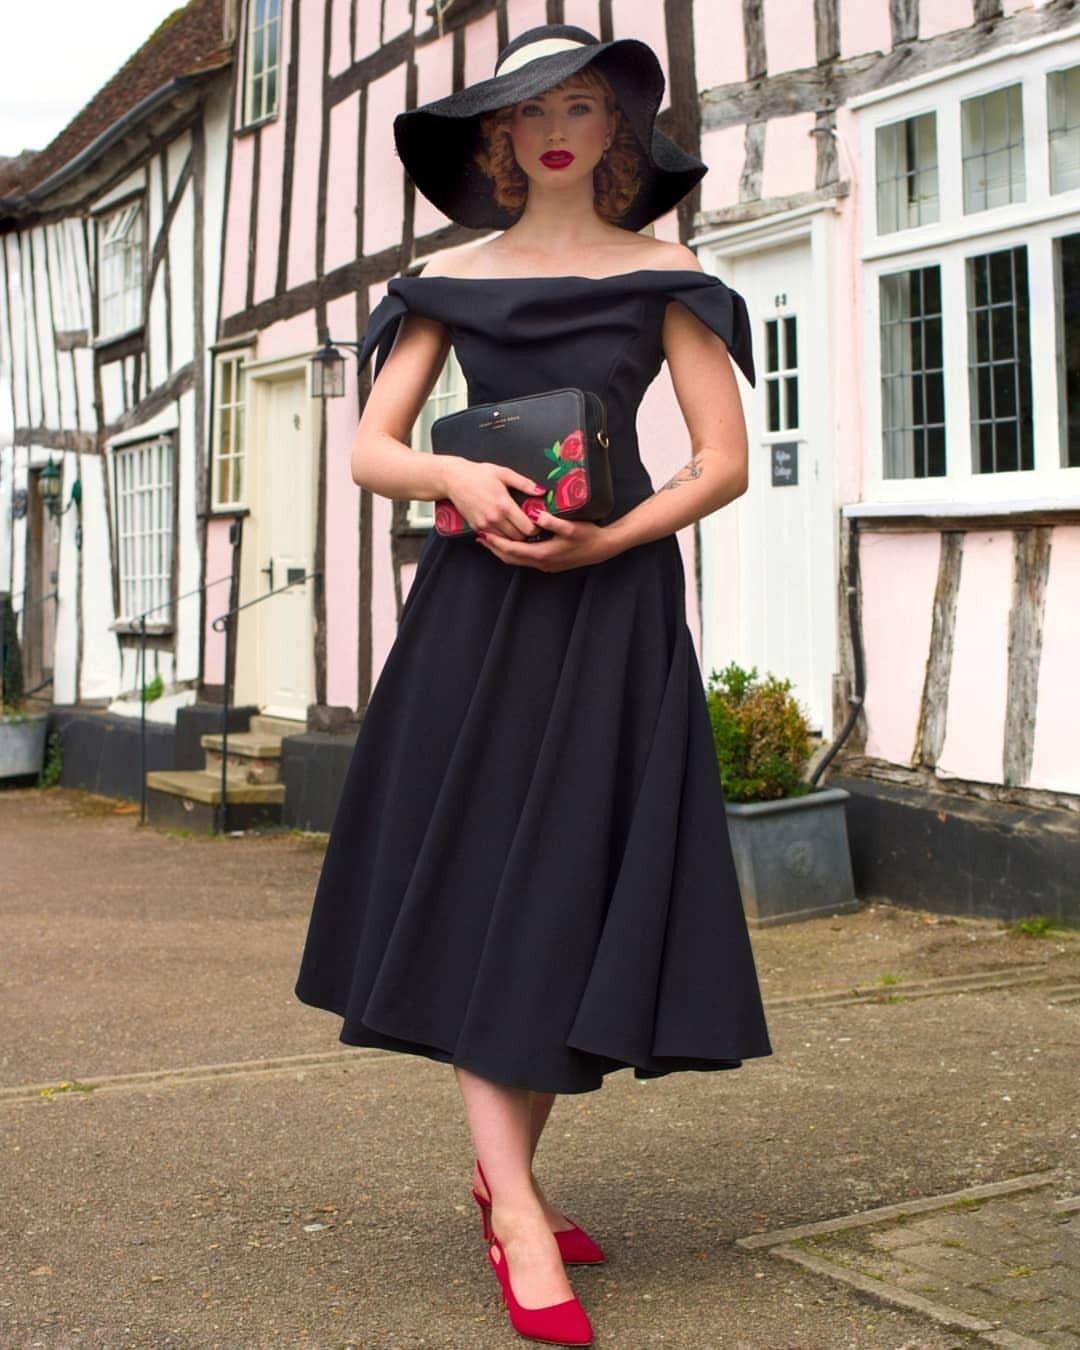 Abigail Janine Pretty Dresses The Pretty Dress Company Black Swing Dress [ 1350 x 1080 Pixel ]